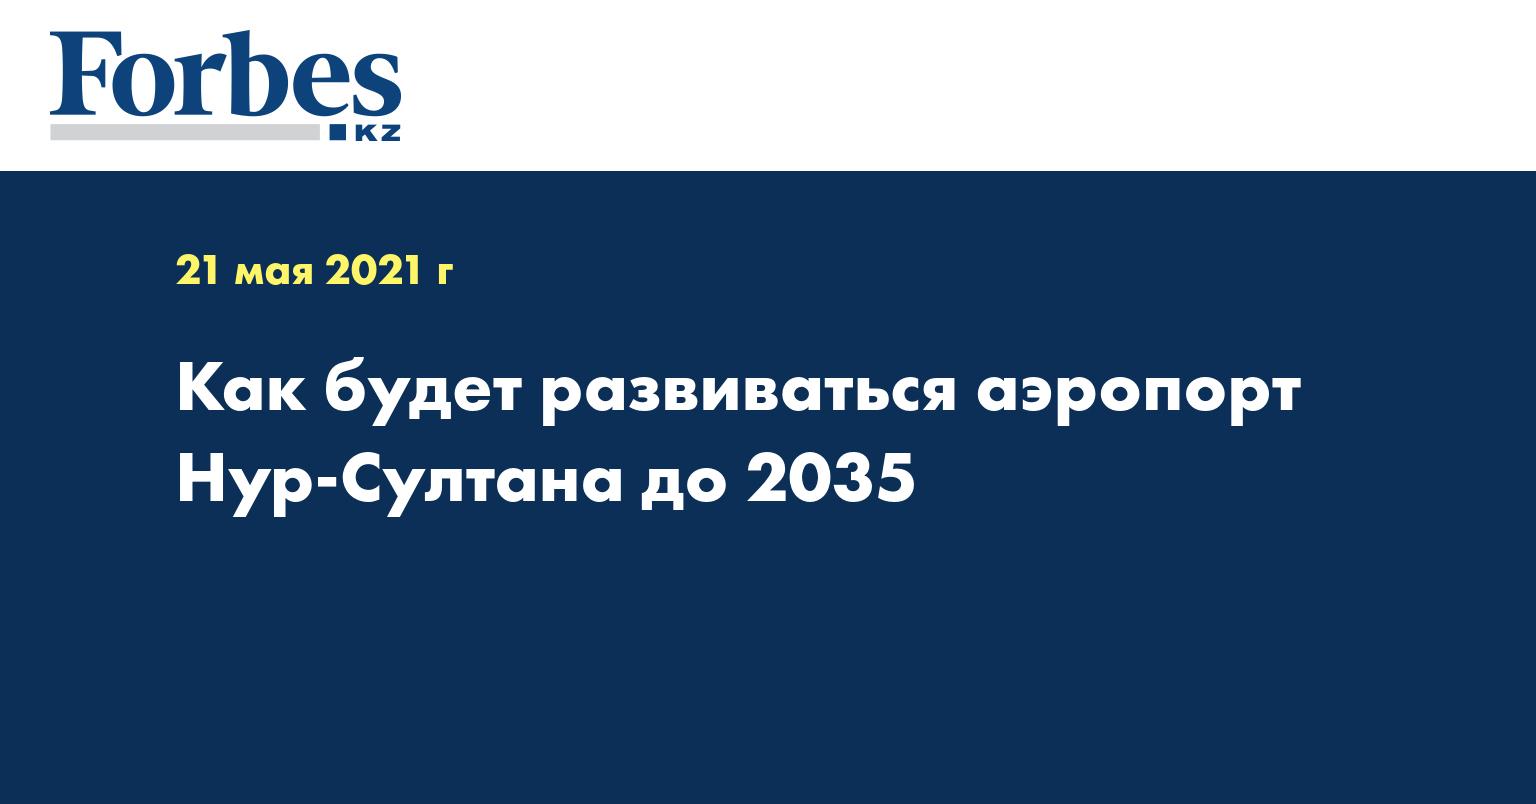 Как будет развиваться аэропорт Нур-Султана до 2035